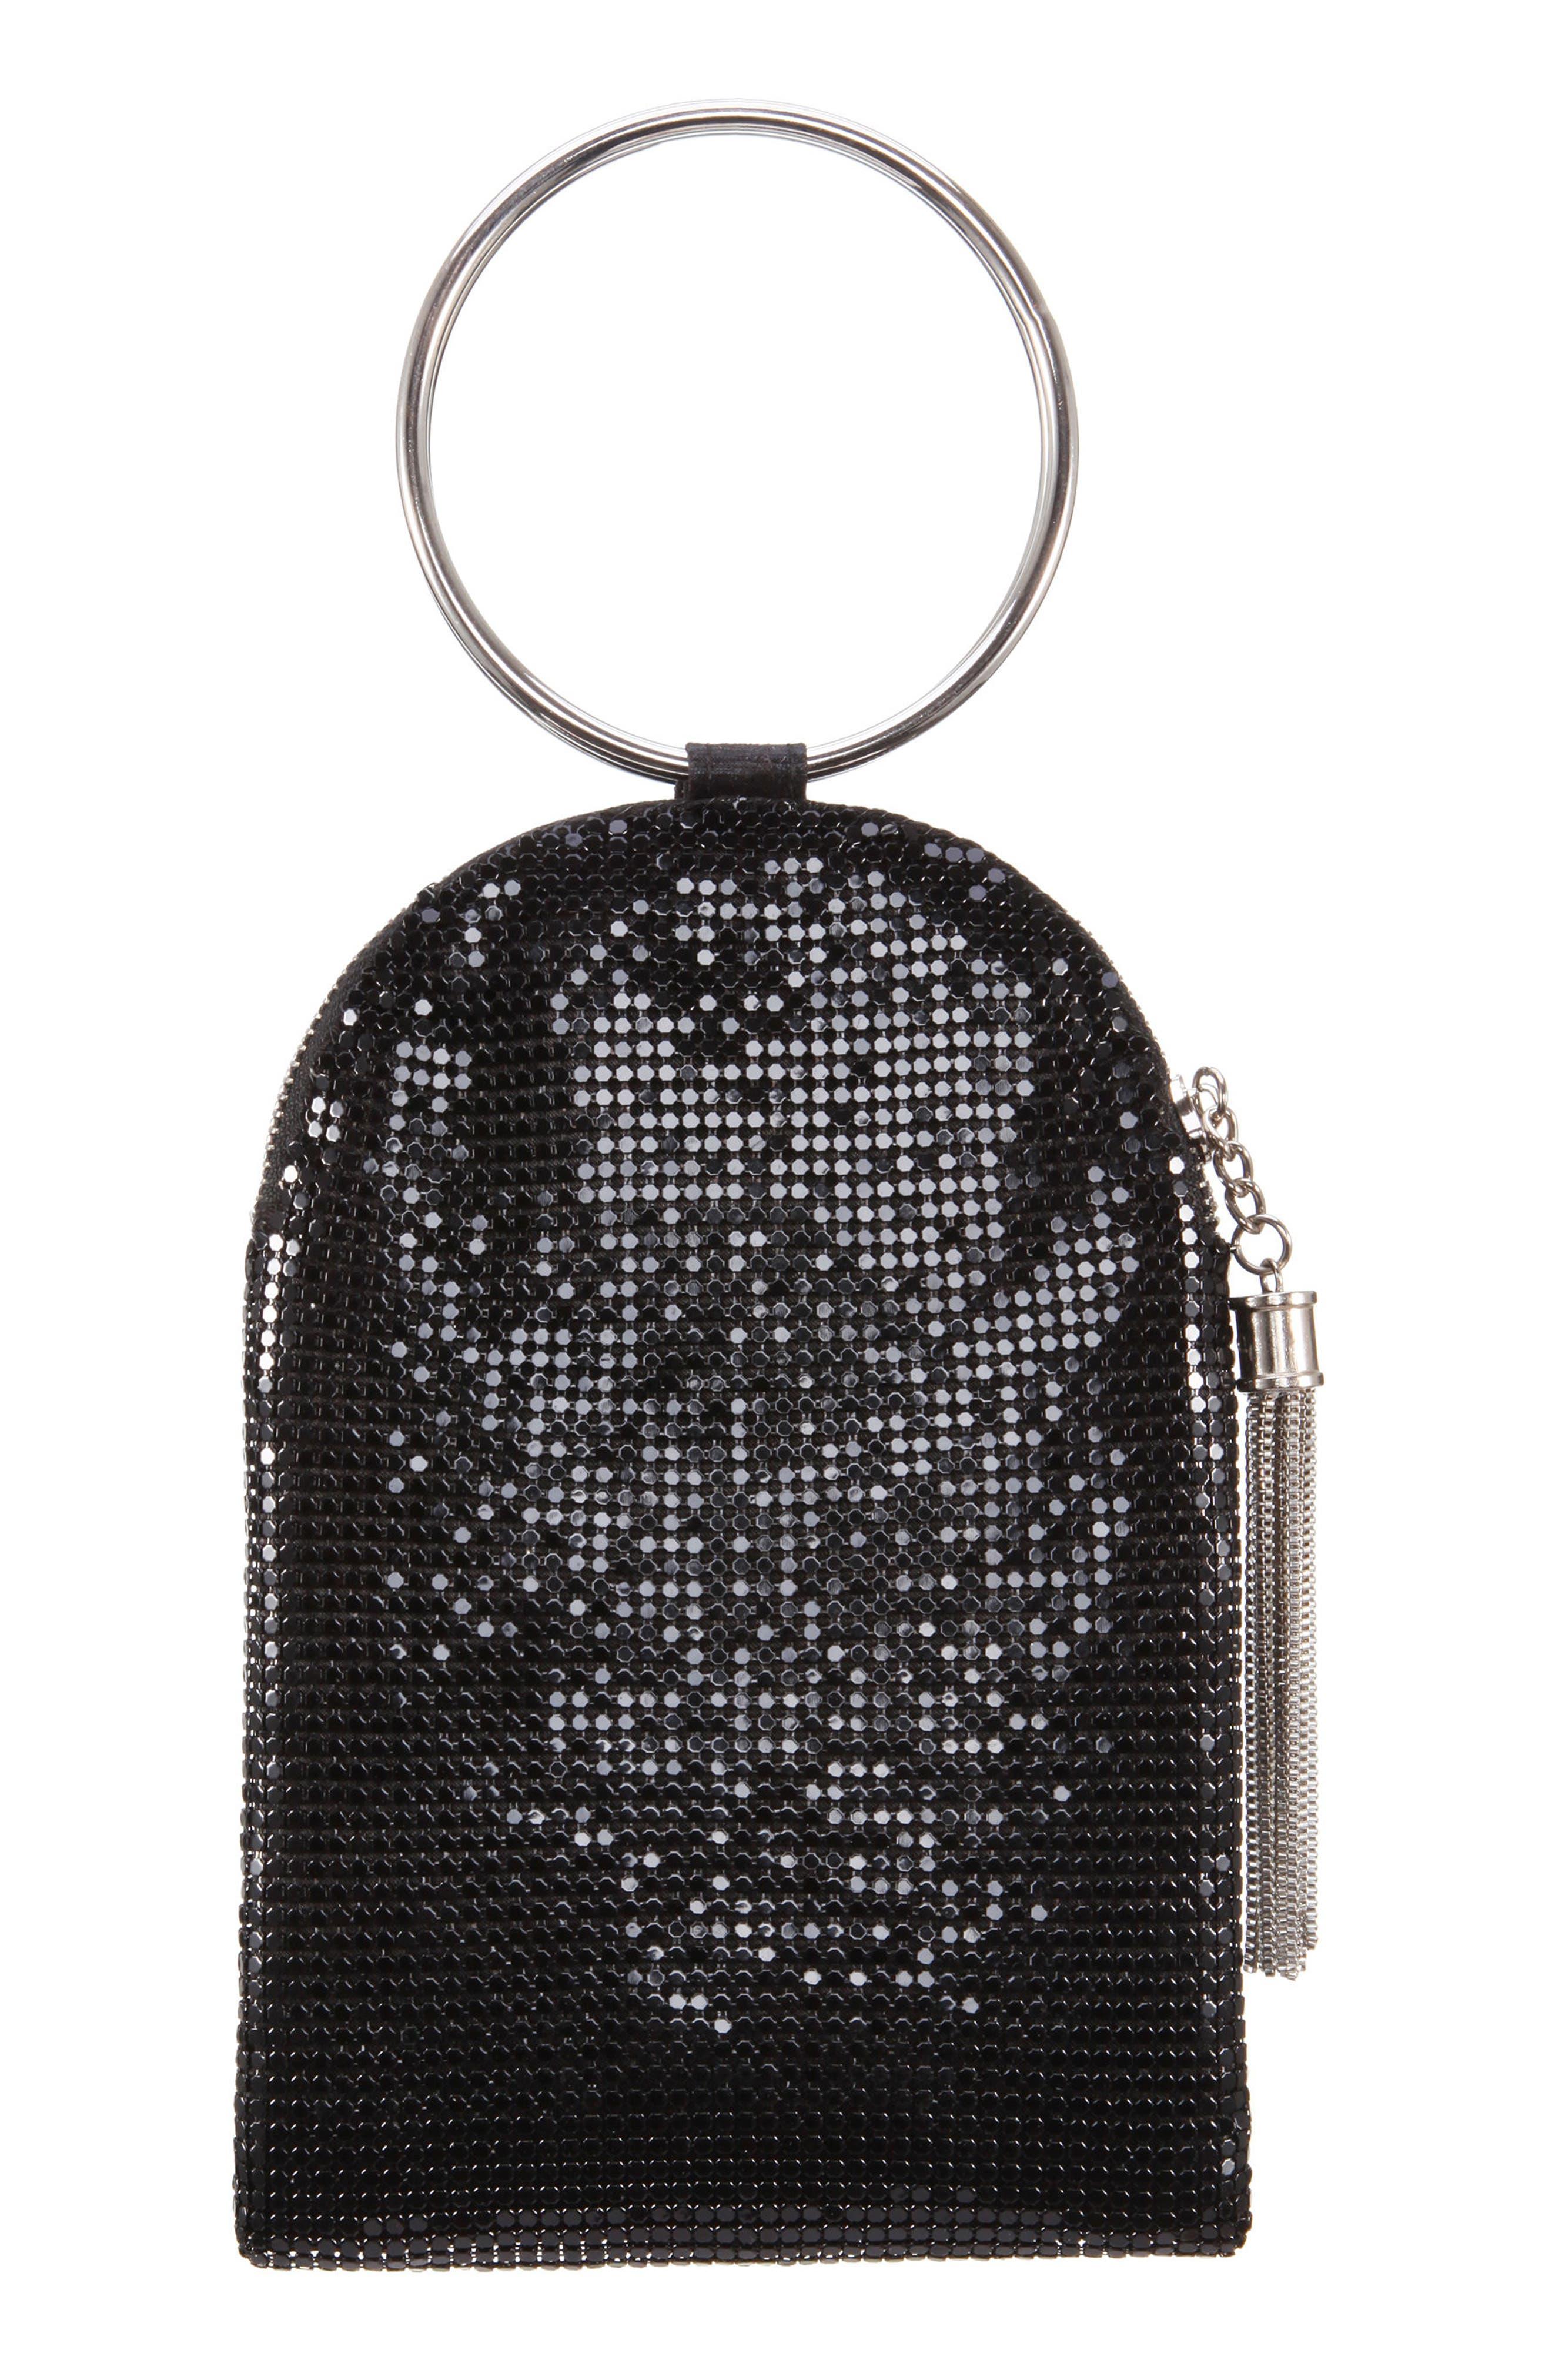 Metallic Mesh Handbag - Black